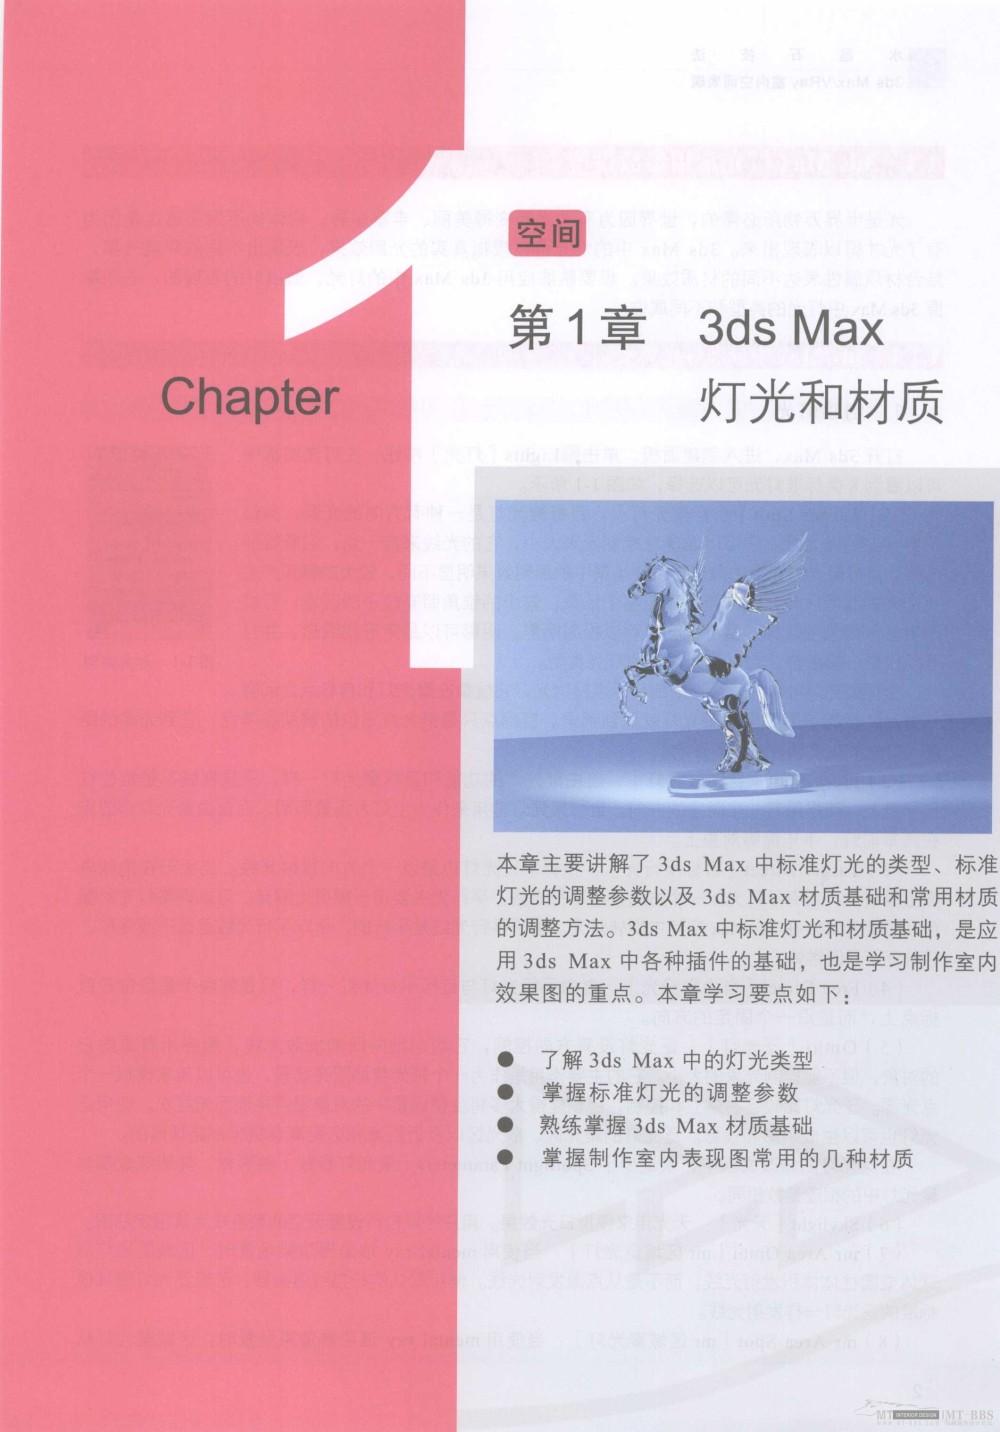 水晶石技法-3ds_Max&VRay室内空间表现_水晶石技法-3ds_Max&VRay室内空间表现_页面_007.jpg